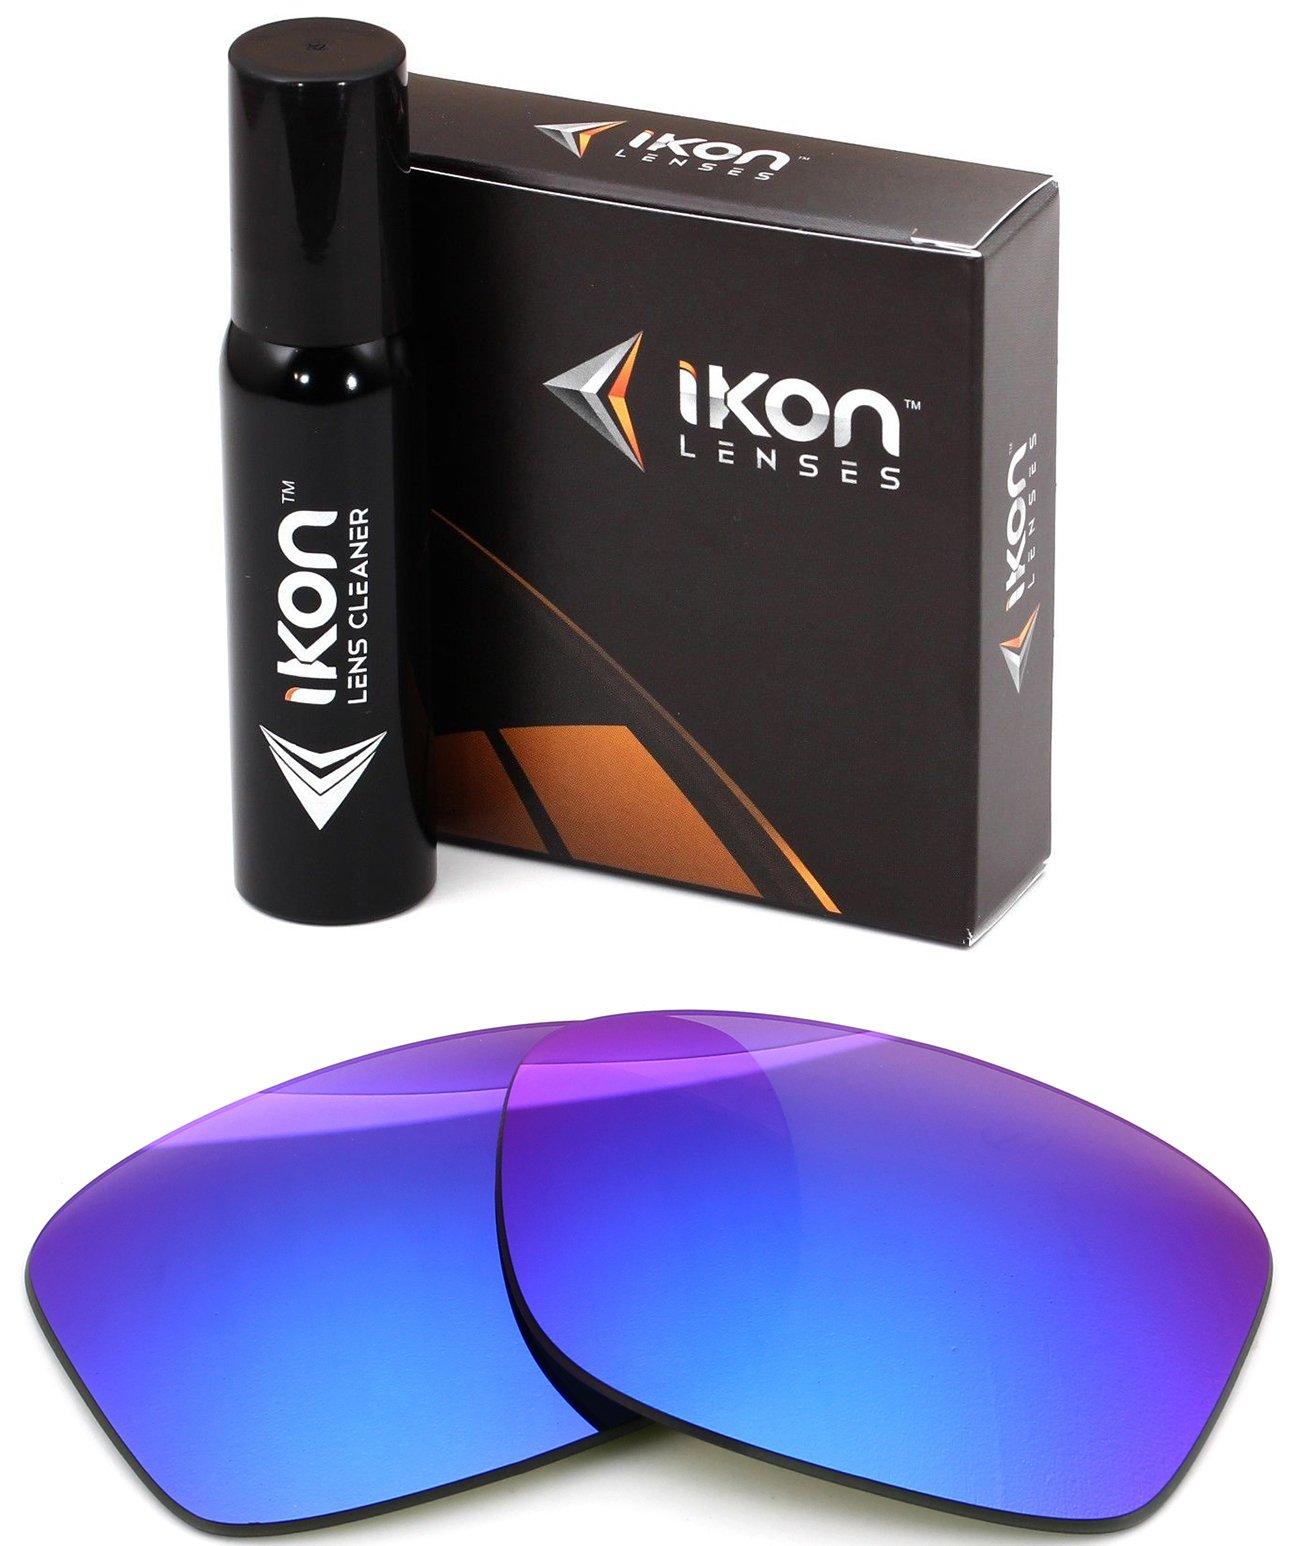 Ikon Lenses Polarized IKON Replacement Lenses For Von Zipper Lesmore Sunglasses - Violet